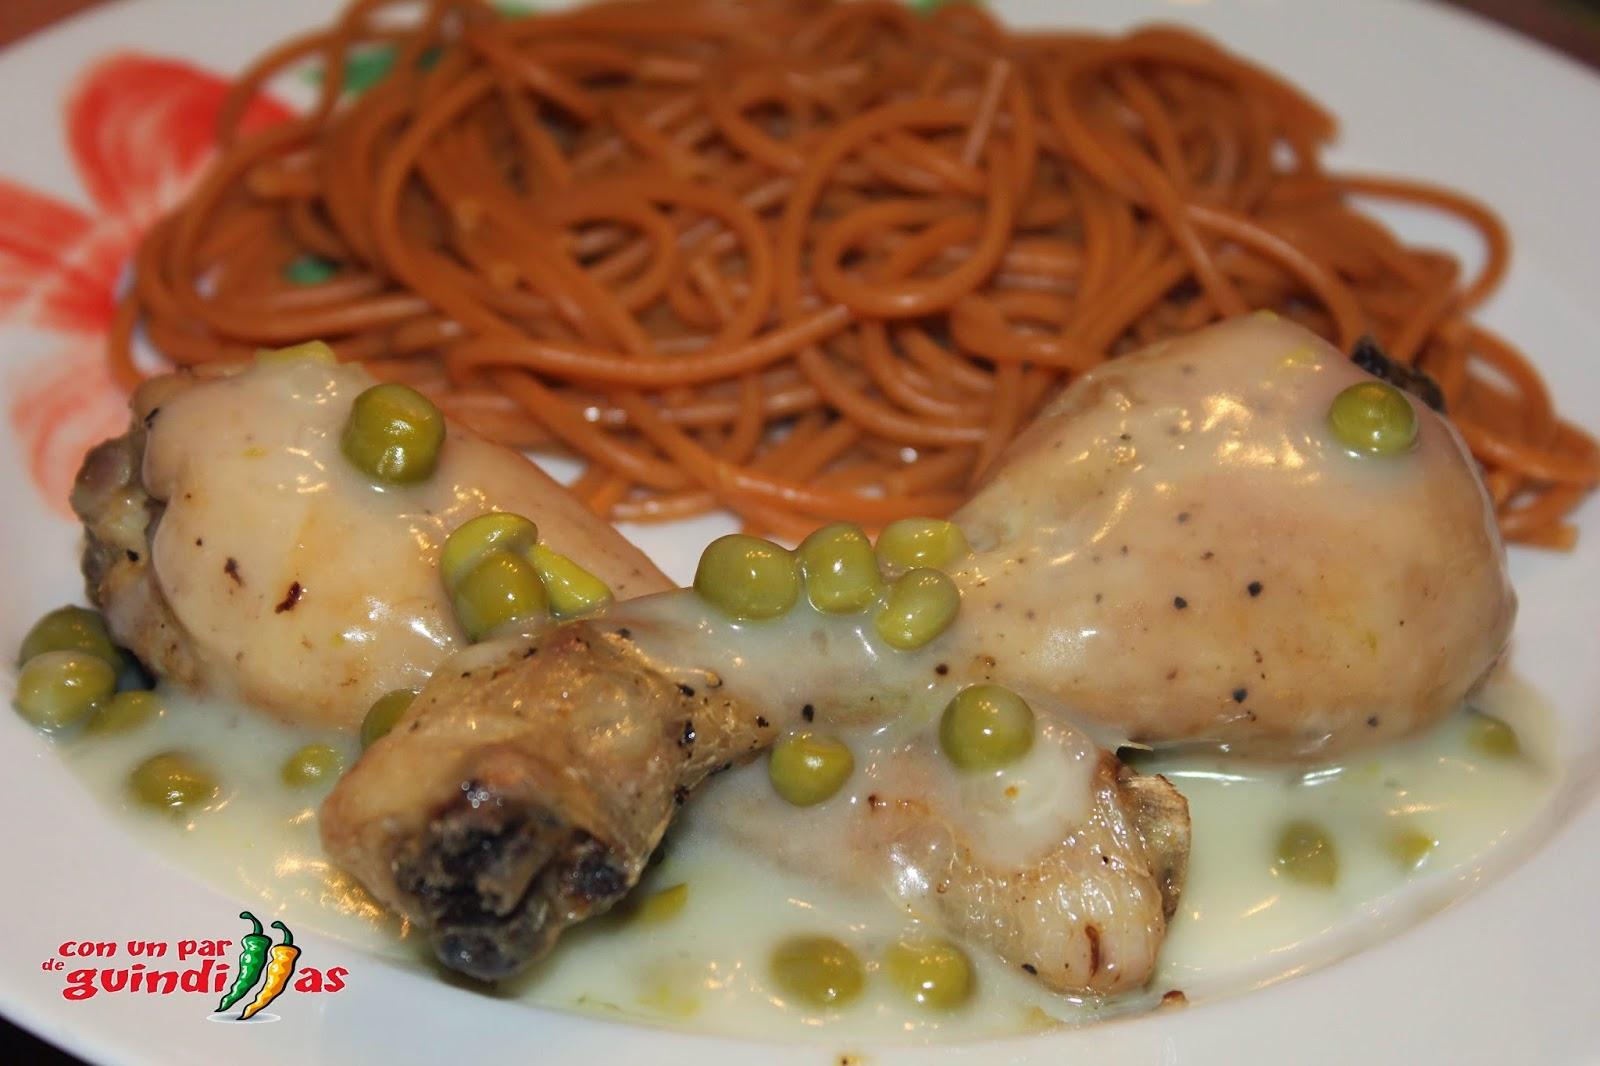 Jamoncitos de pollo al Jerez con espaguetis